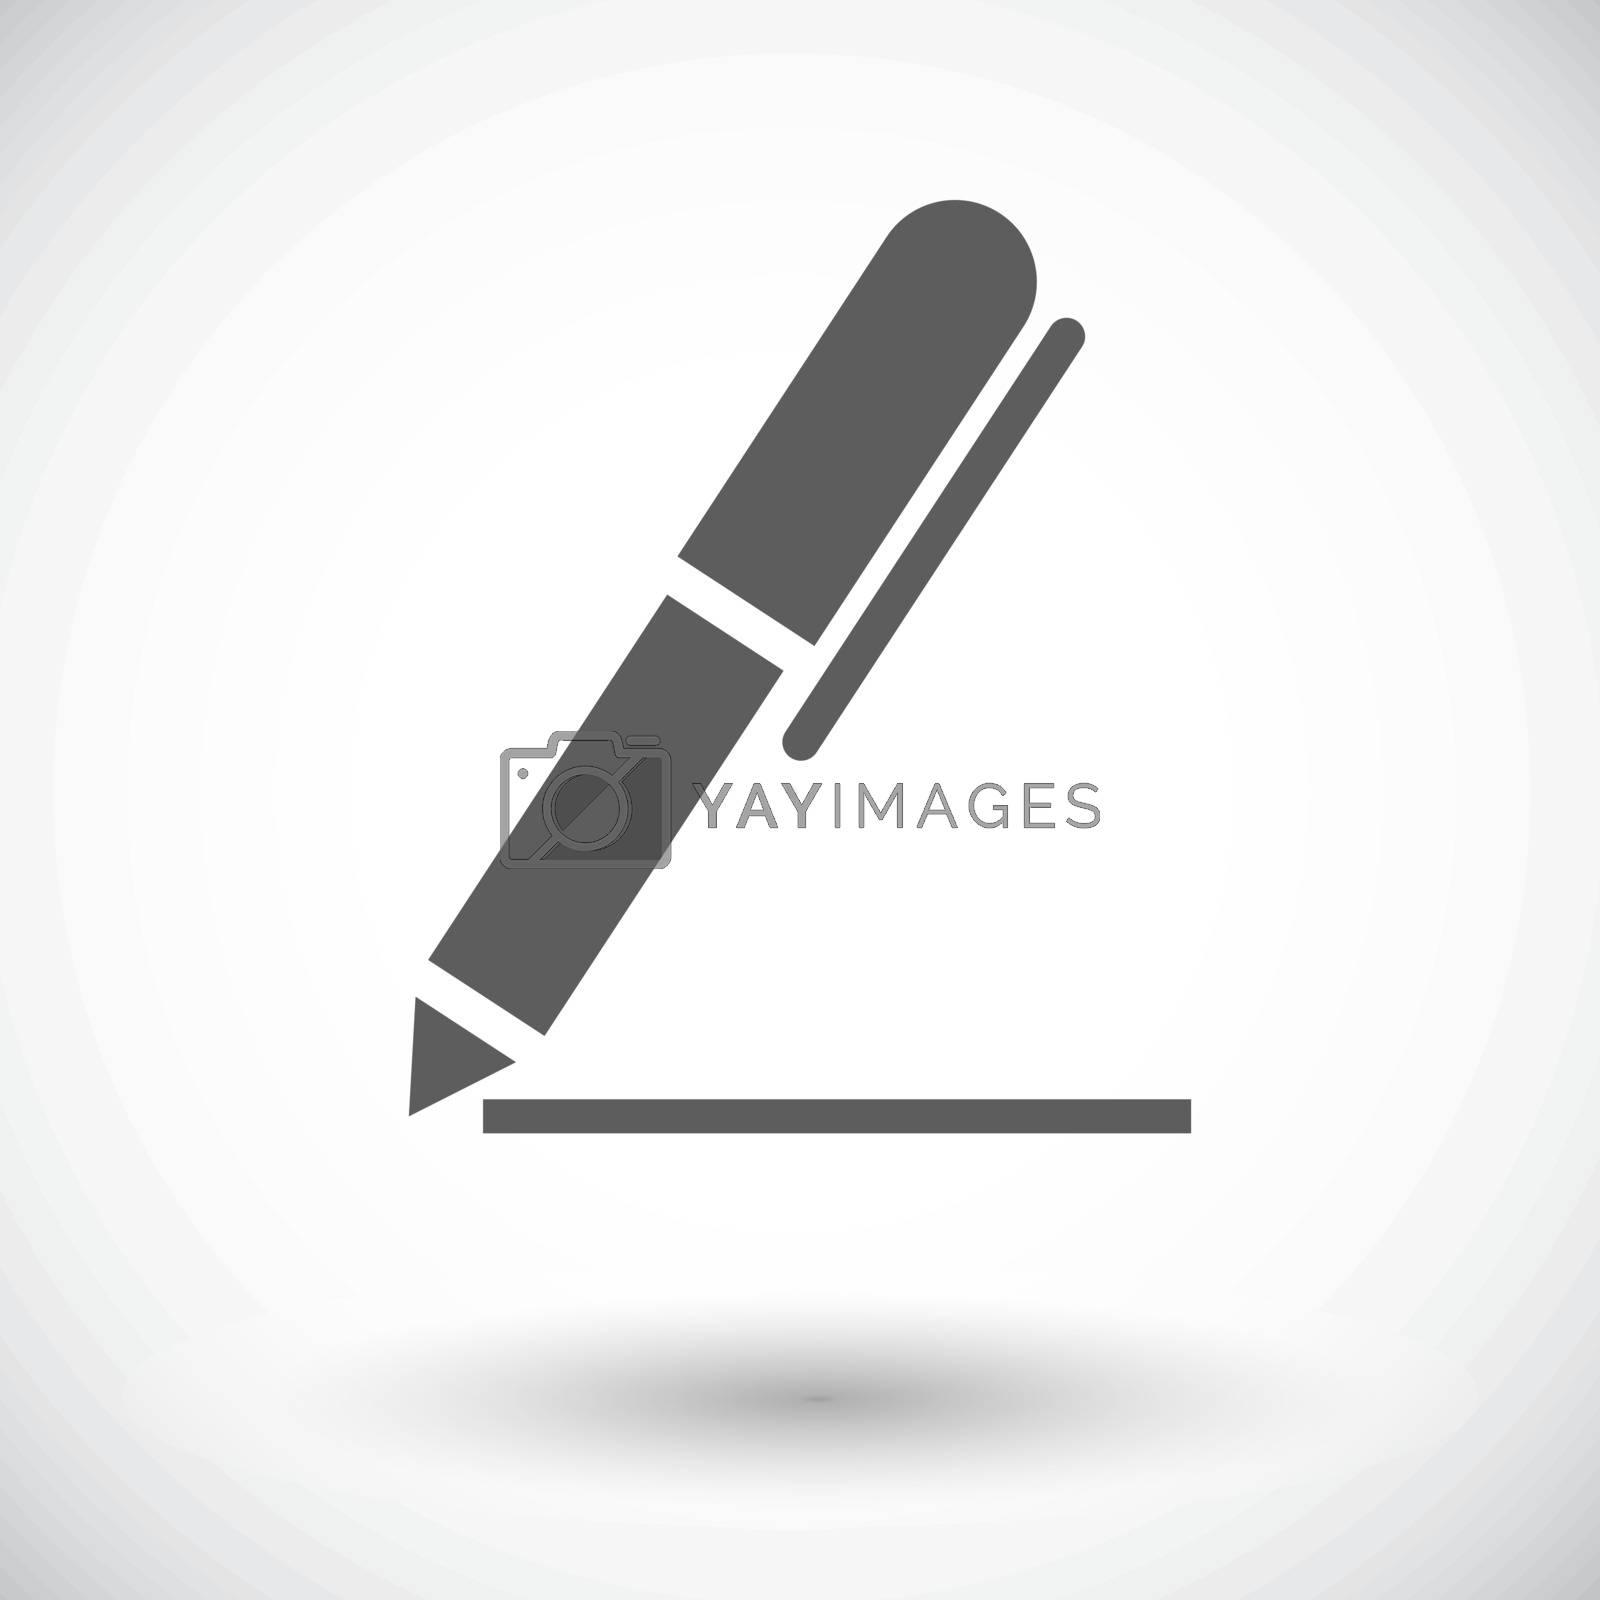 Notes. Single flat icon on white background. Vector illustration.